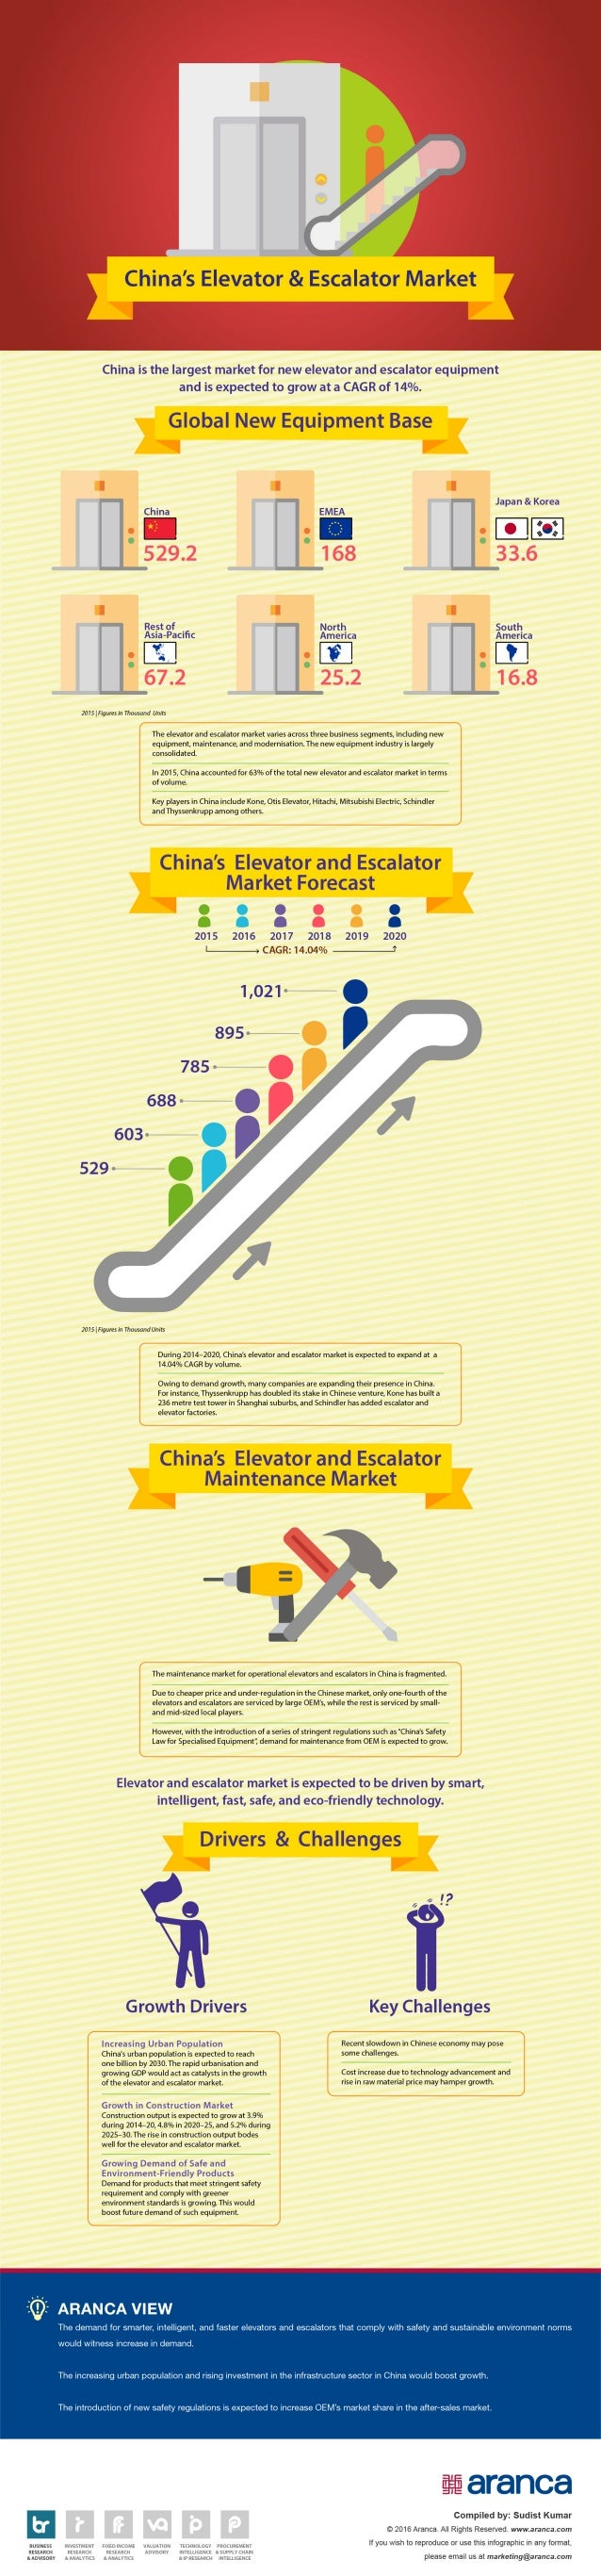 China's Elevator and Escalator Market